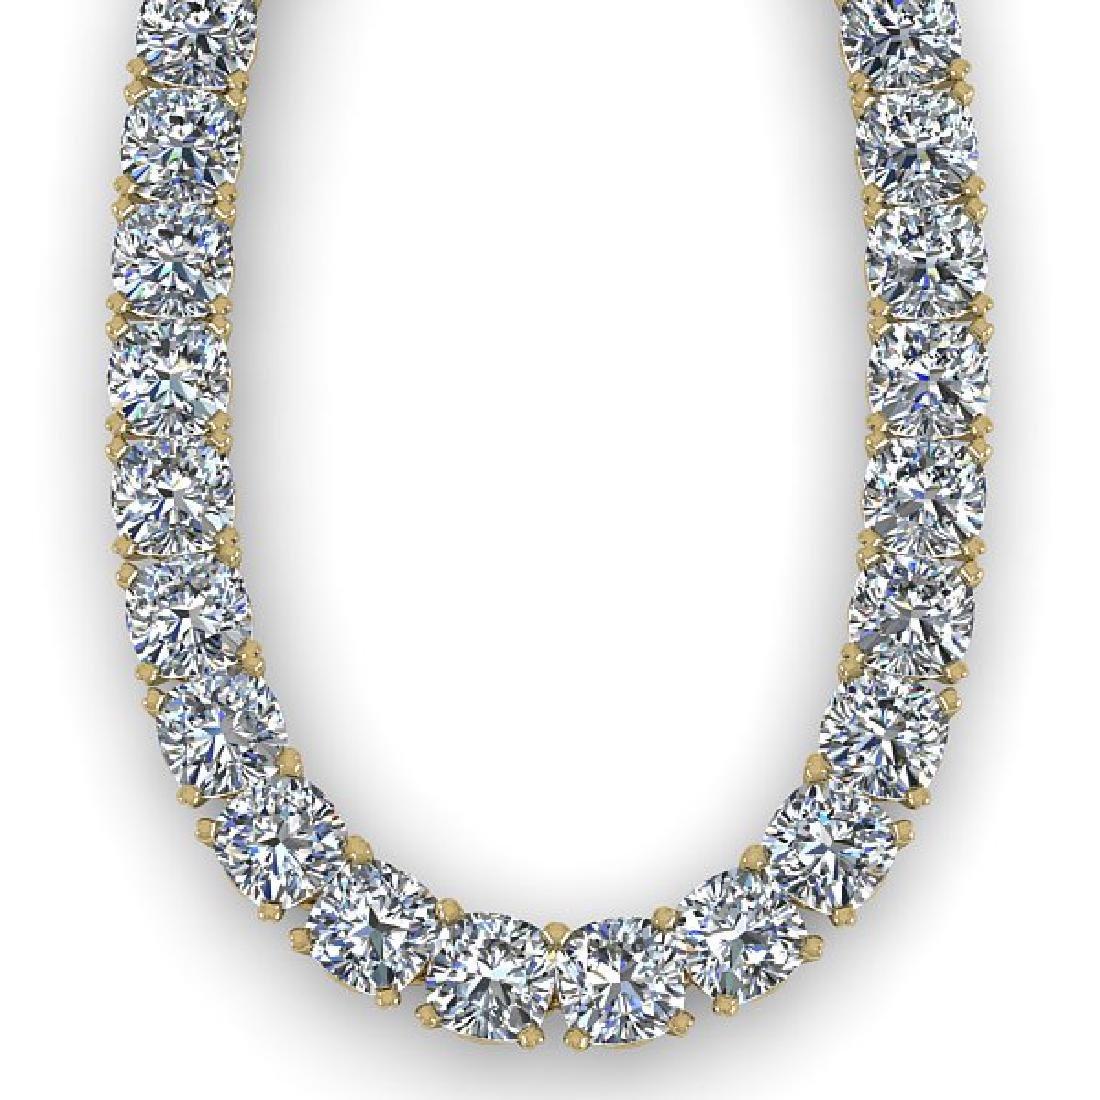 30 CTW Cushion Cut Certified SI Diamond Necklace 14K - 2